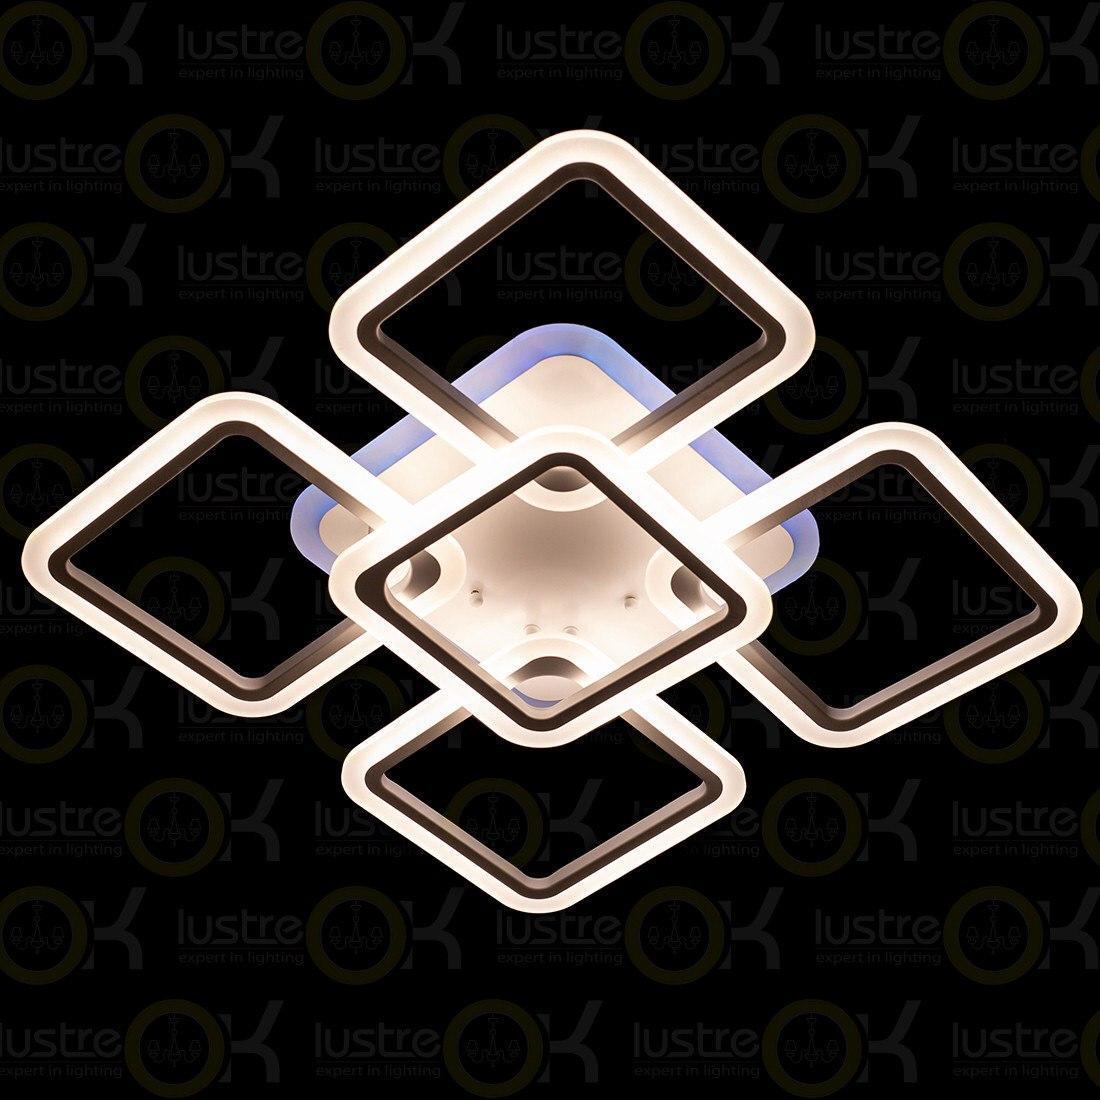 Люстра светодиодная квадратная Люстра с пультом LED 3color dimmer А8060/4+1WH LED 3color di